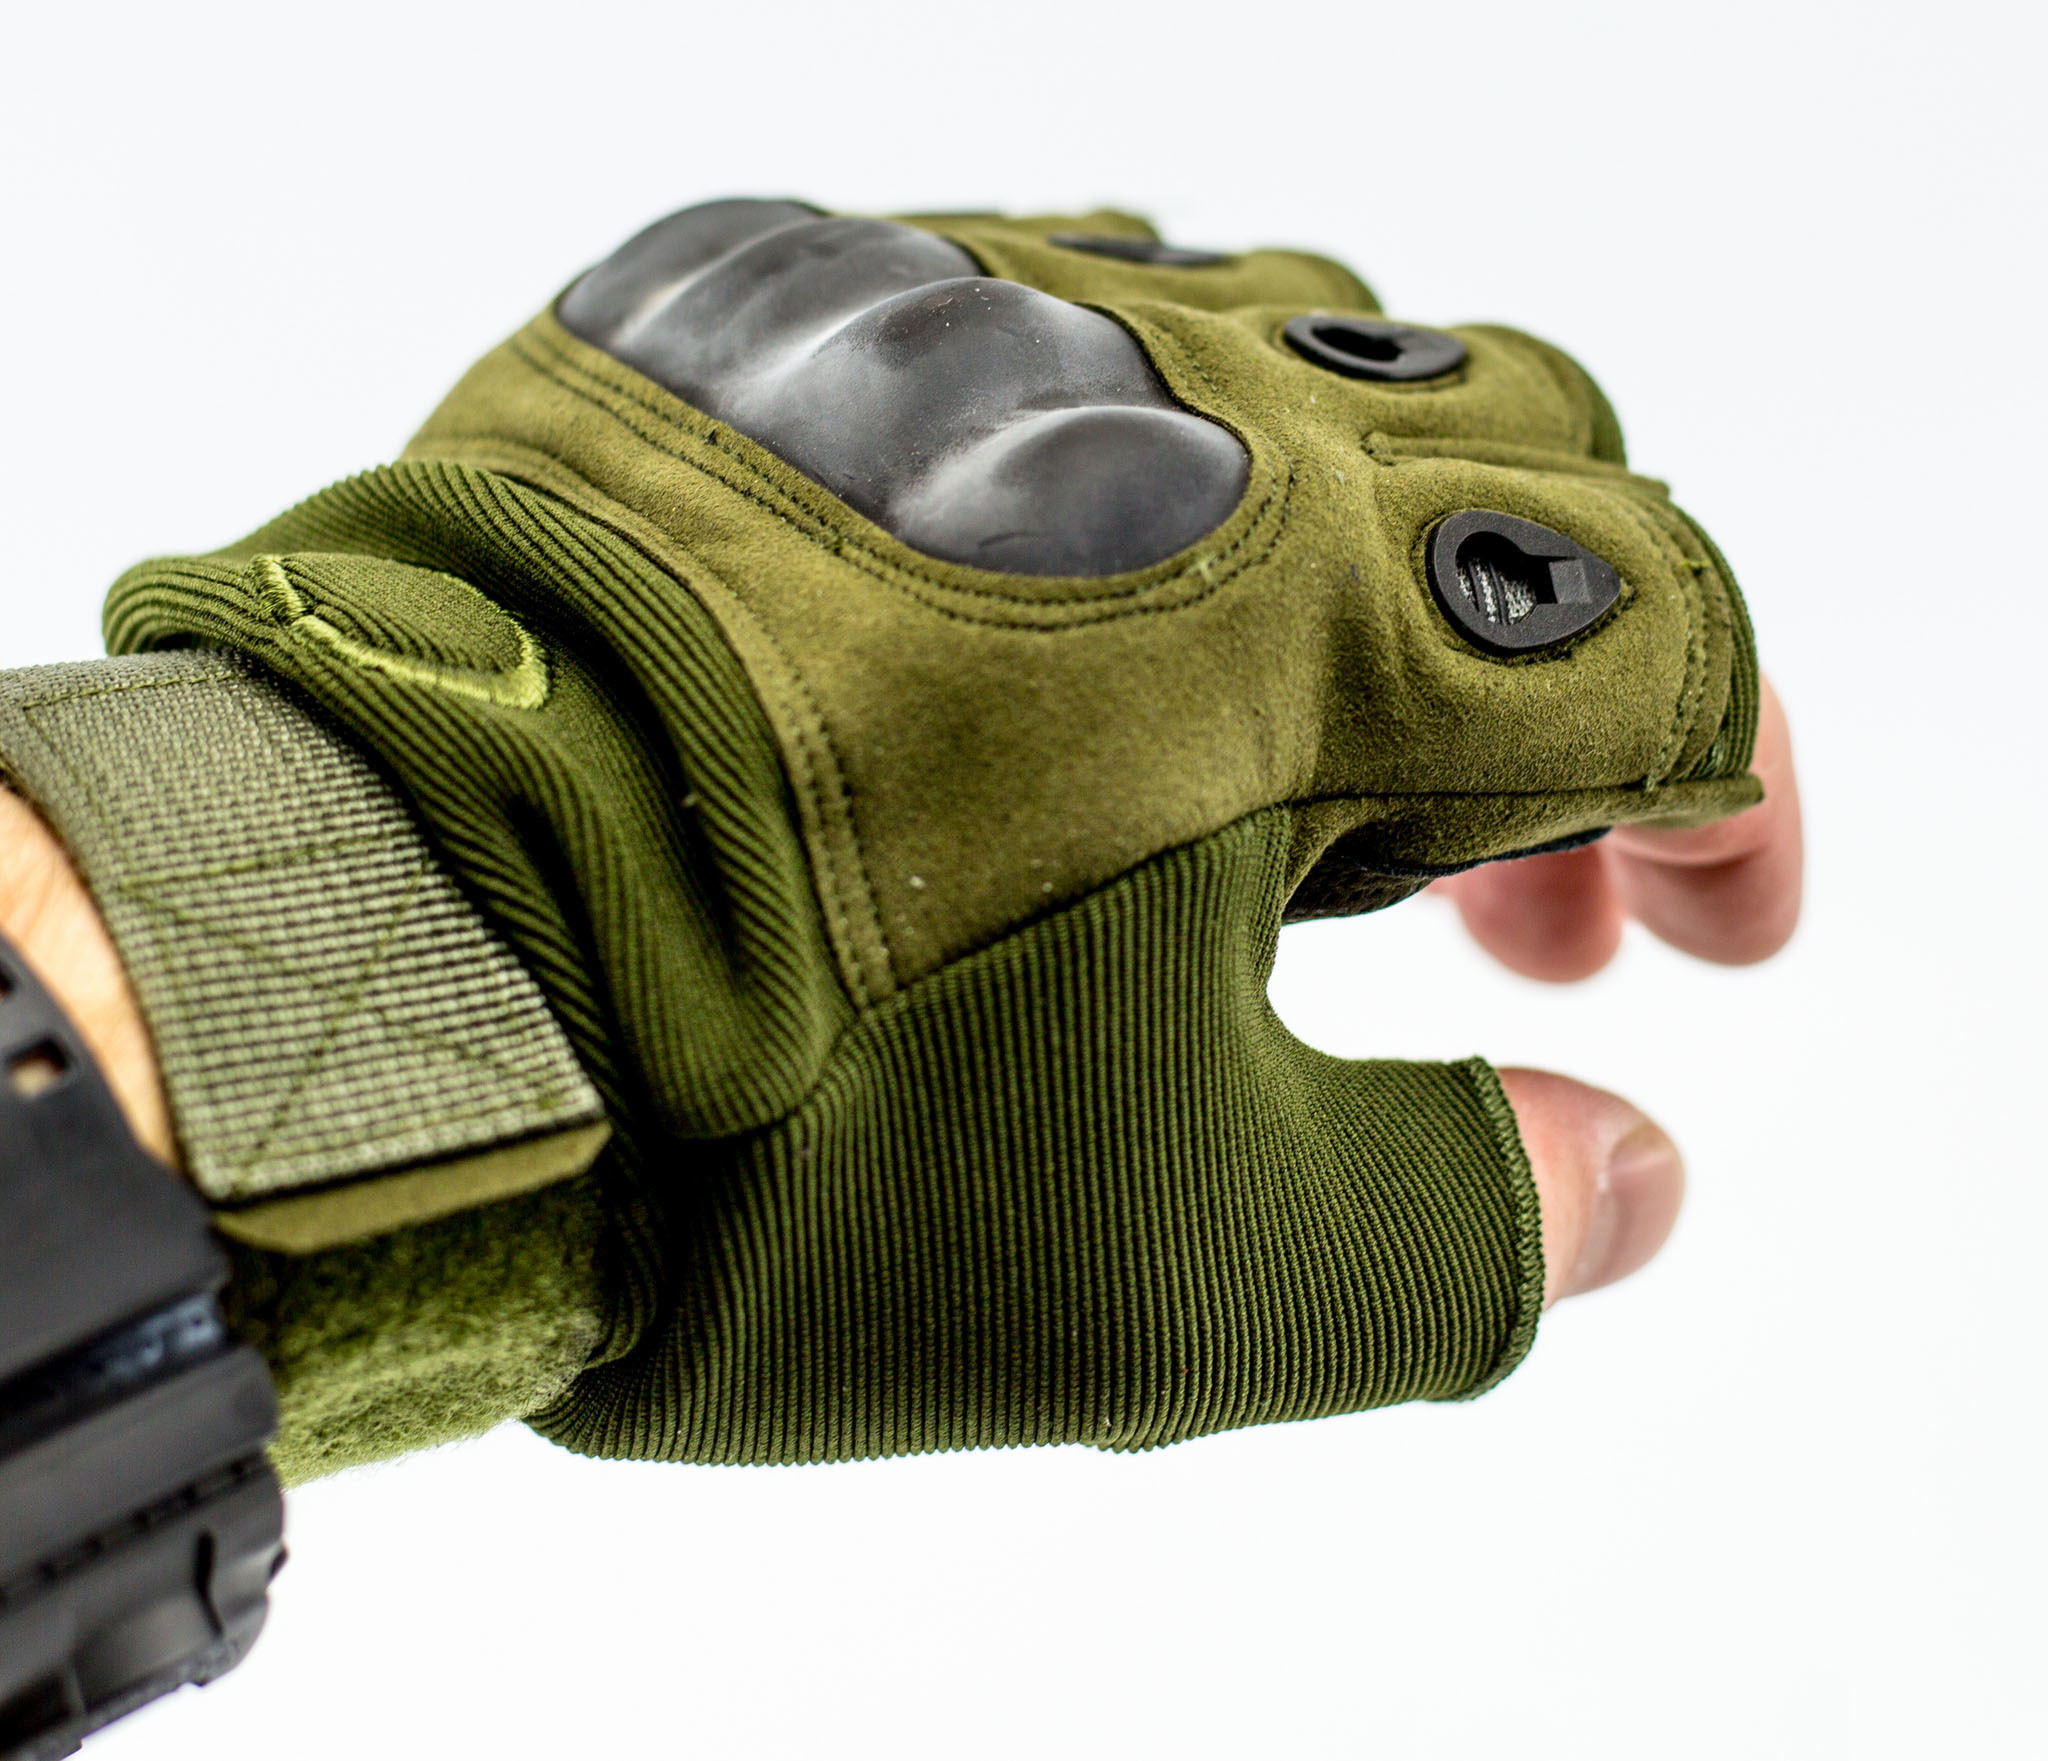 Тактические перчатки без пальцев, армейские , размер XL от China Factory